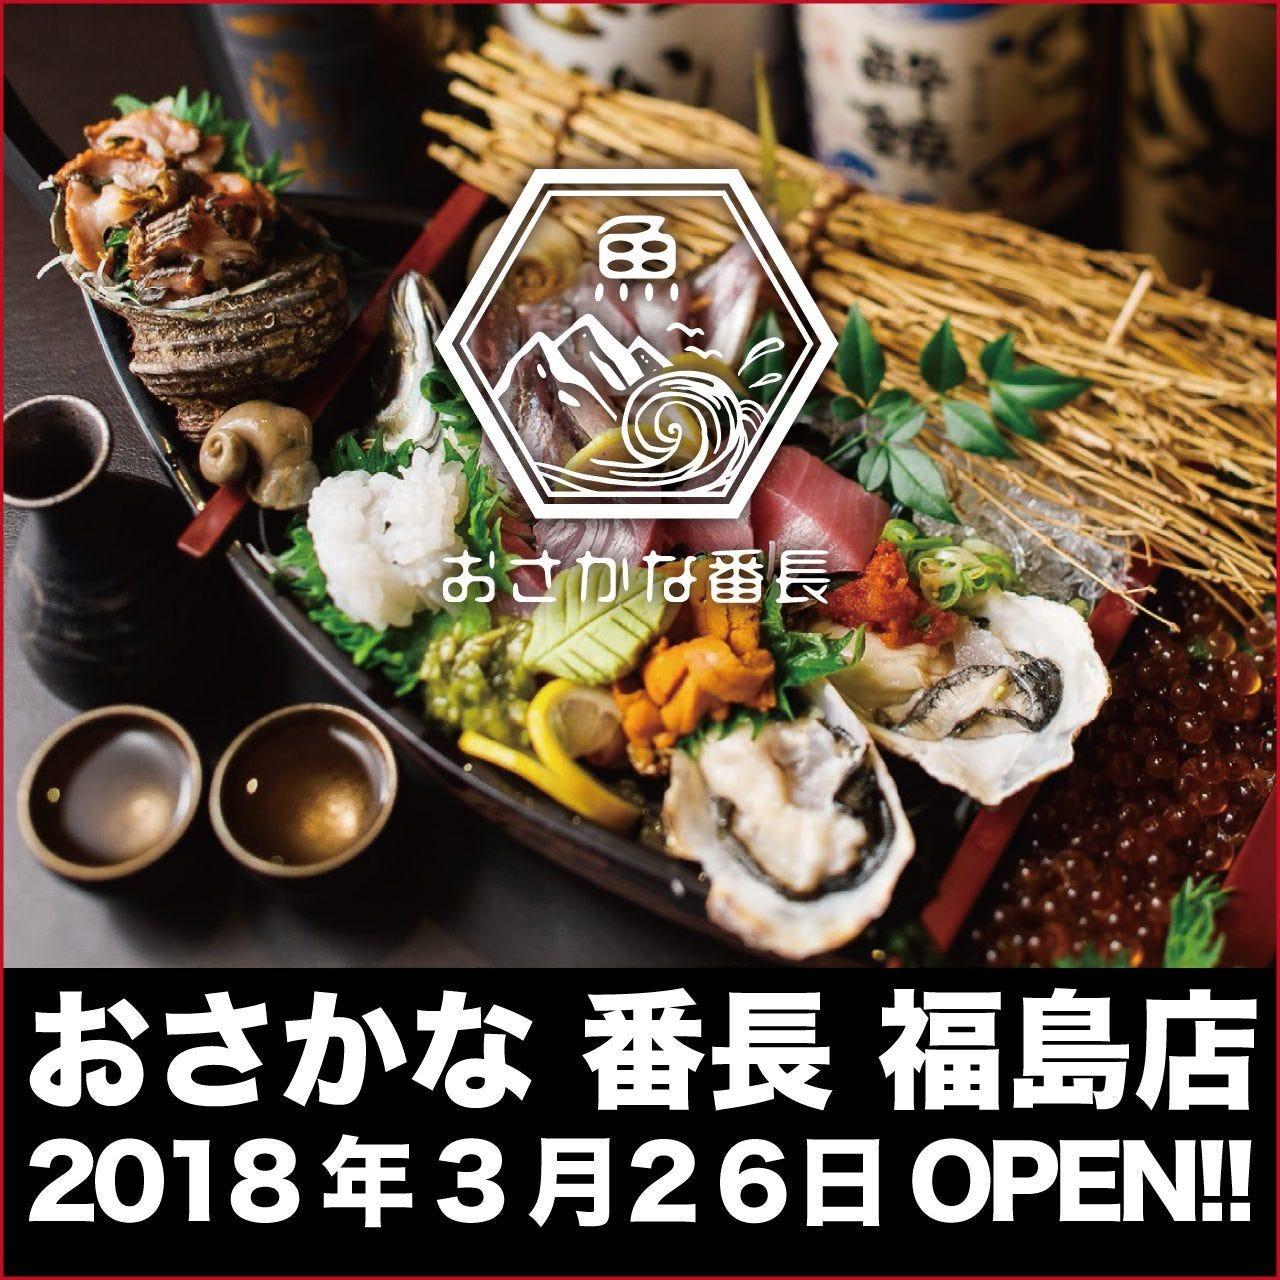 Osakanabancho Fukushimaten